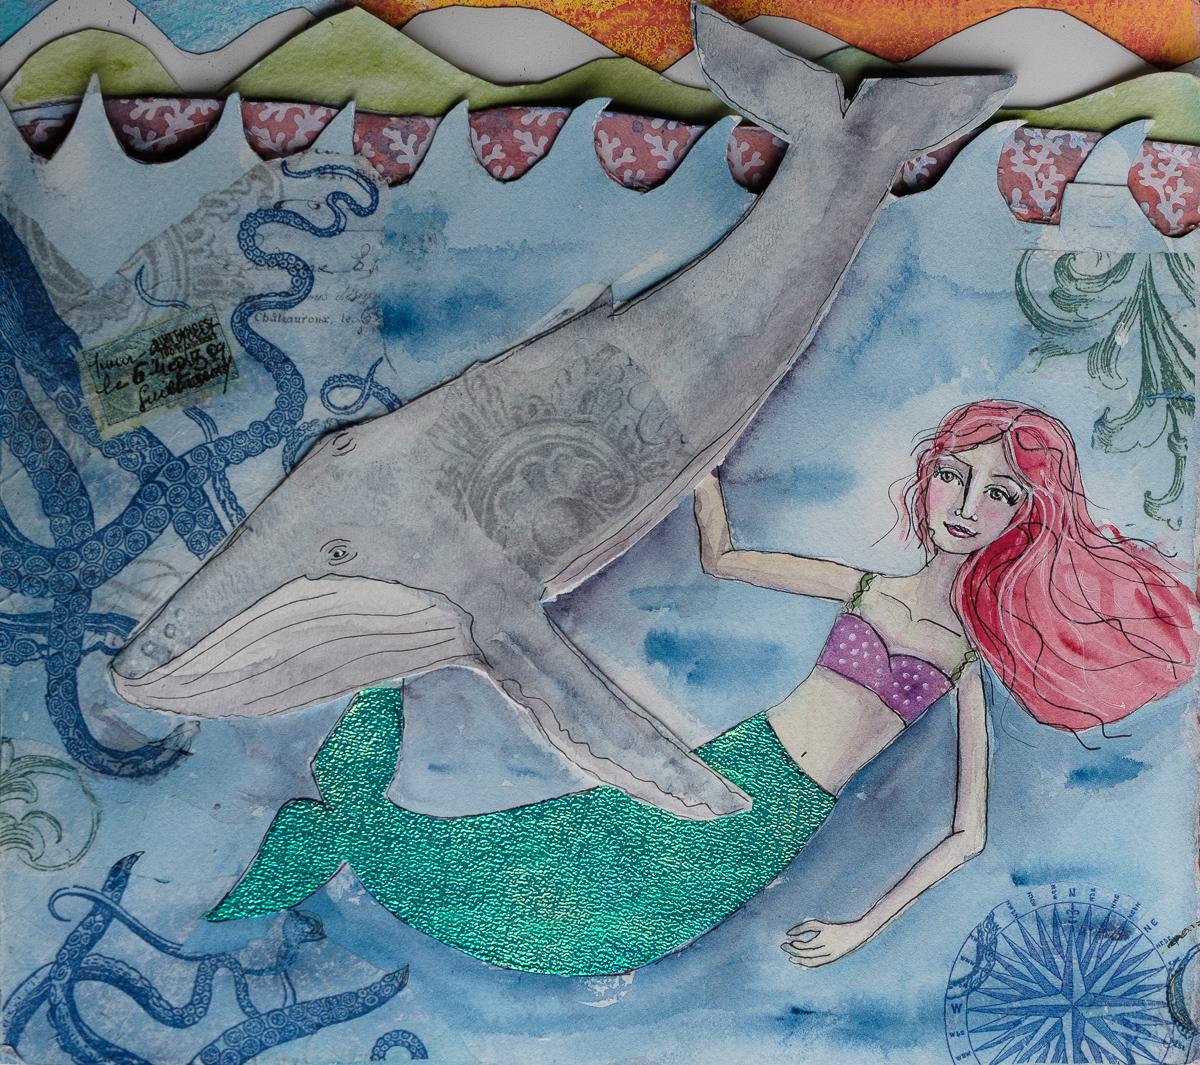 Mermaid and Humpback